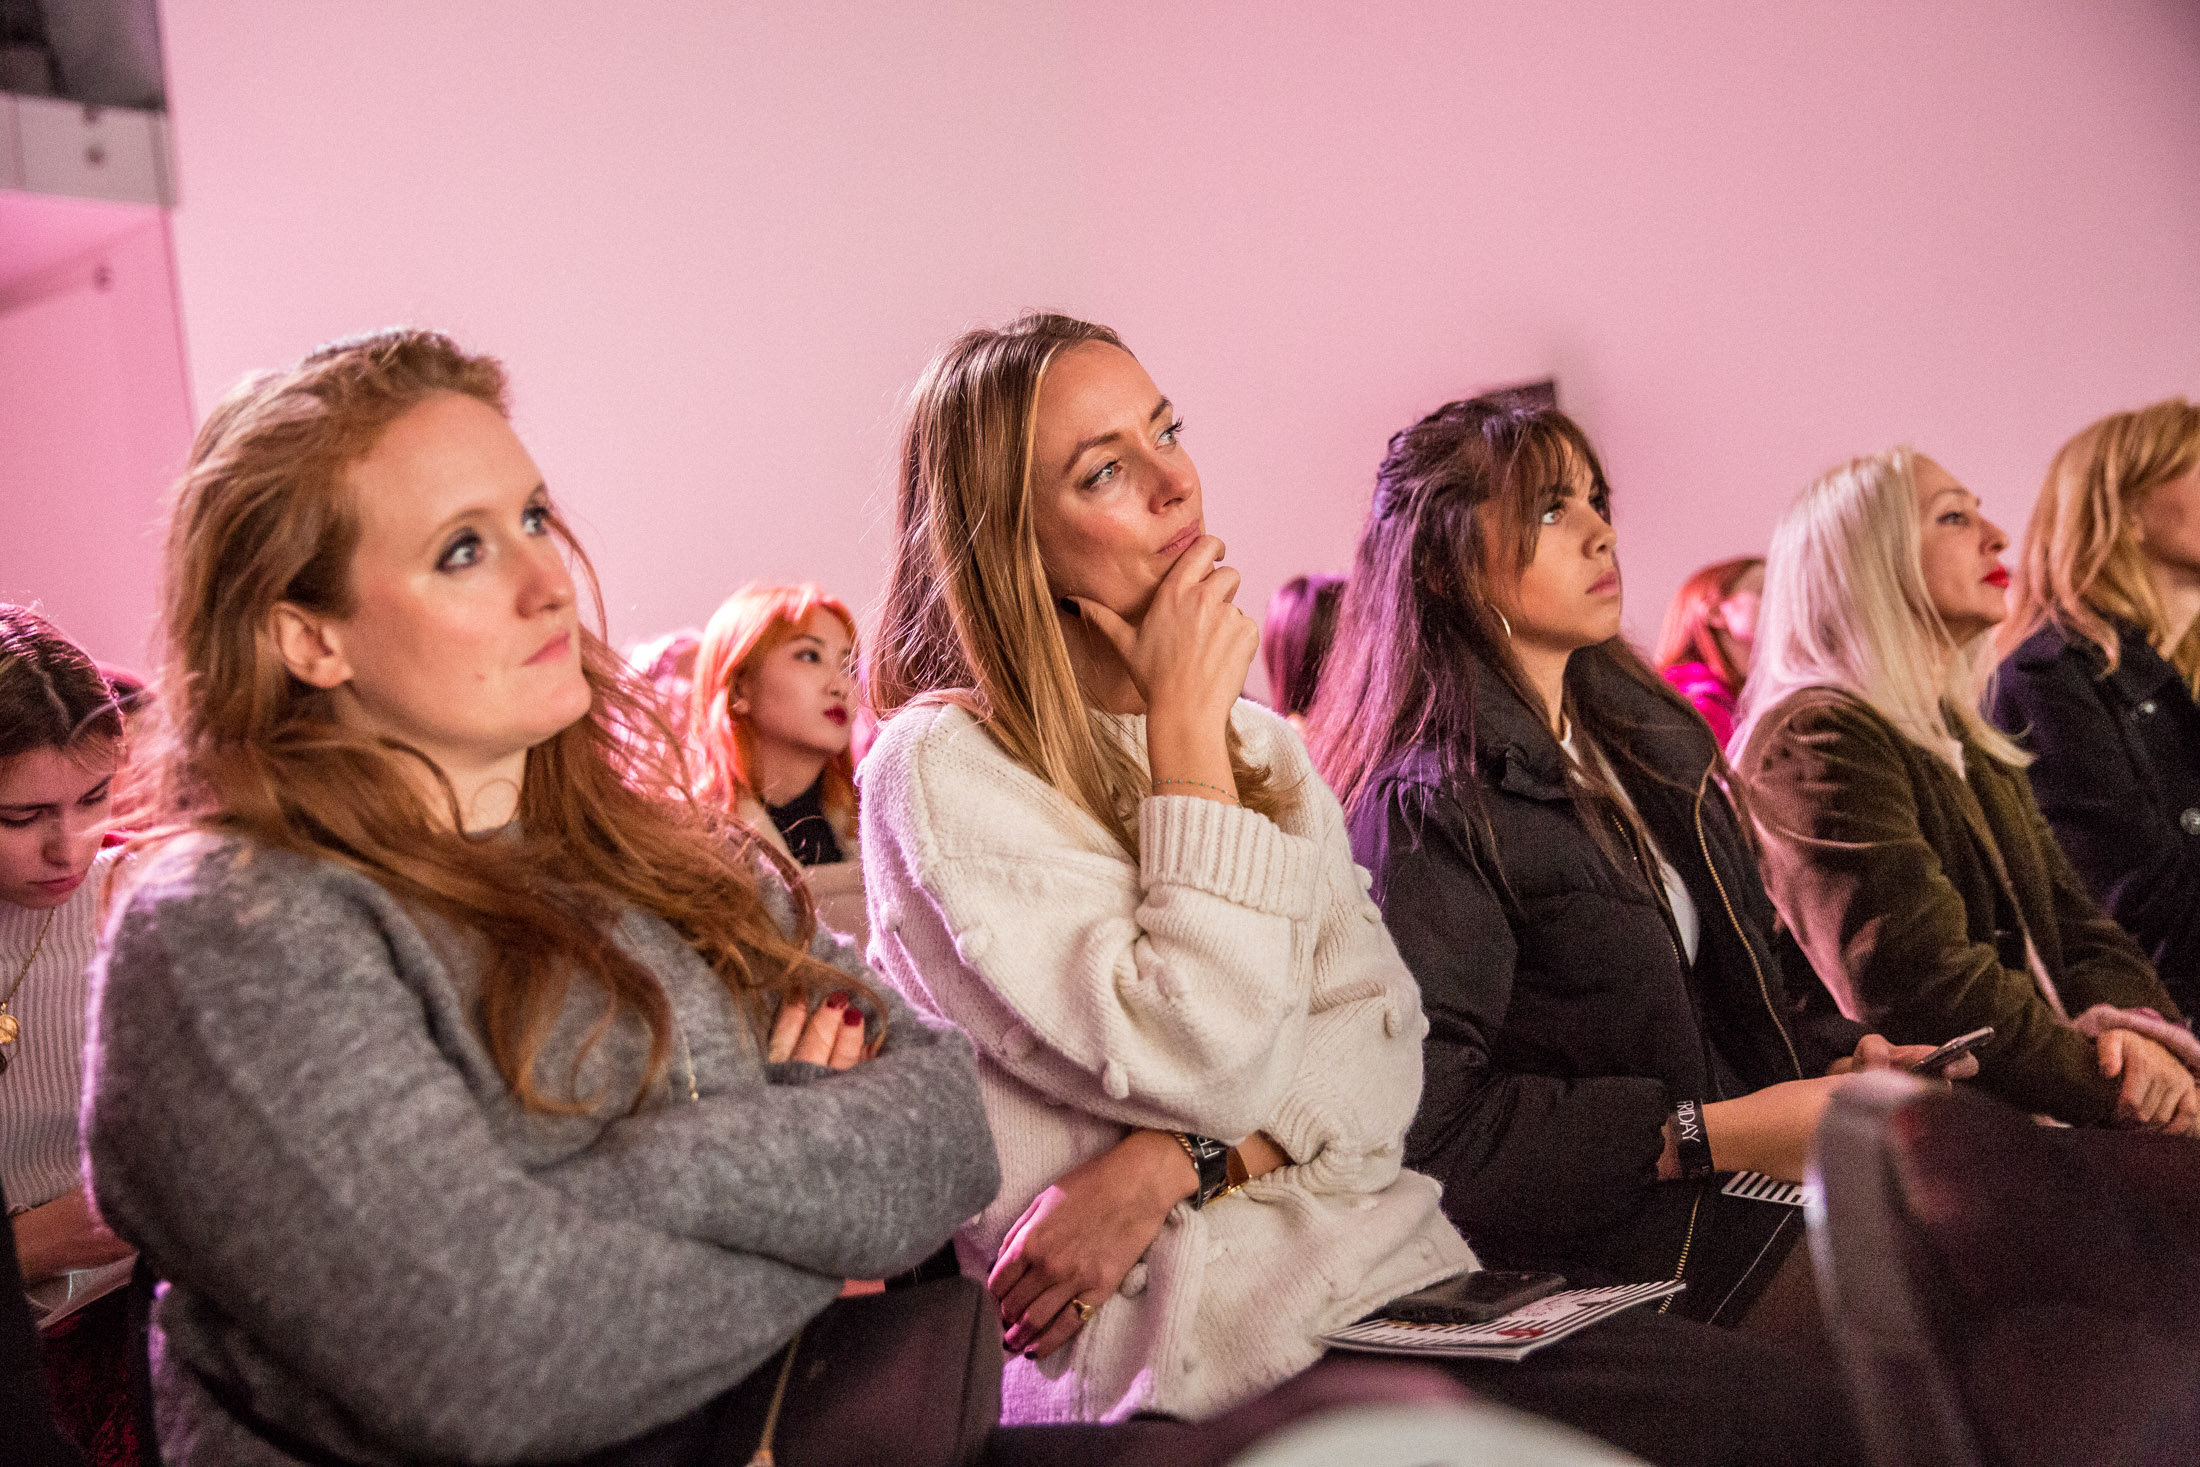 Natalie-Event-Photographer-London (16 of 29).JPG